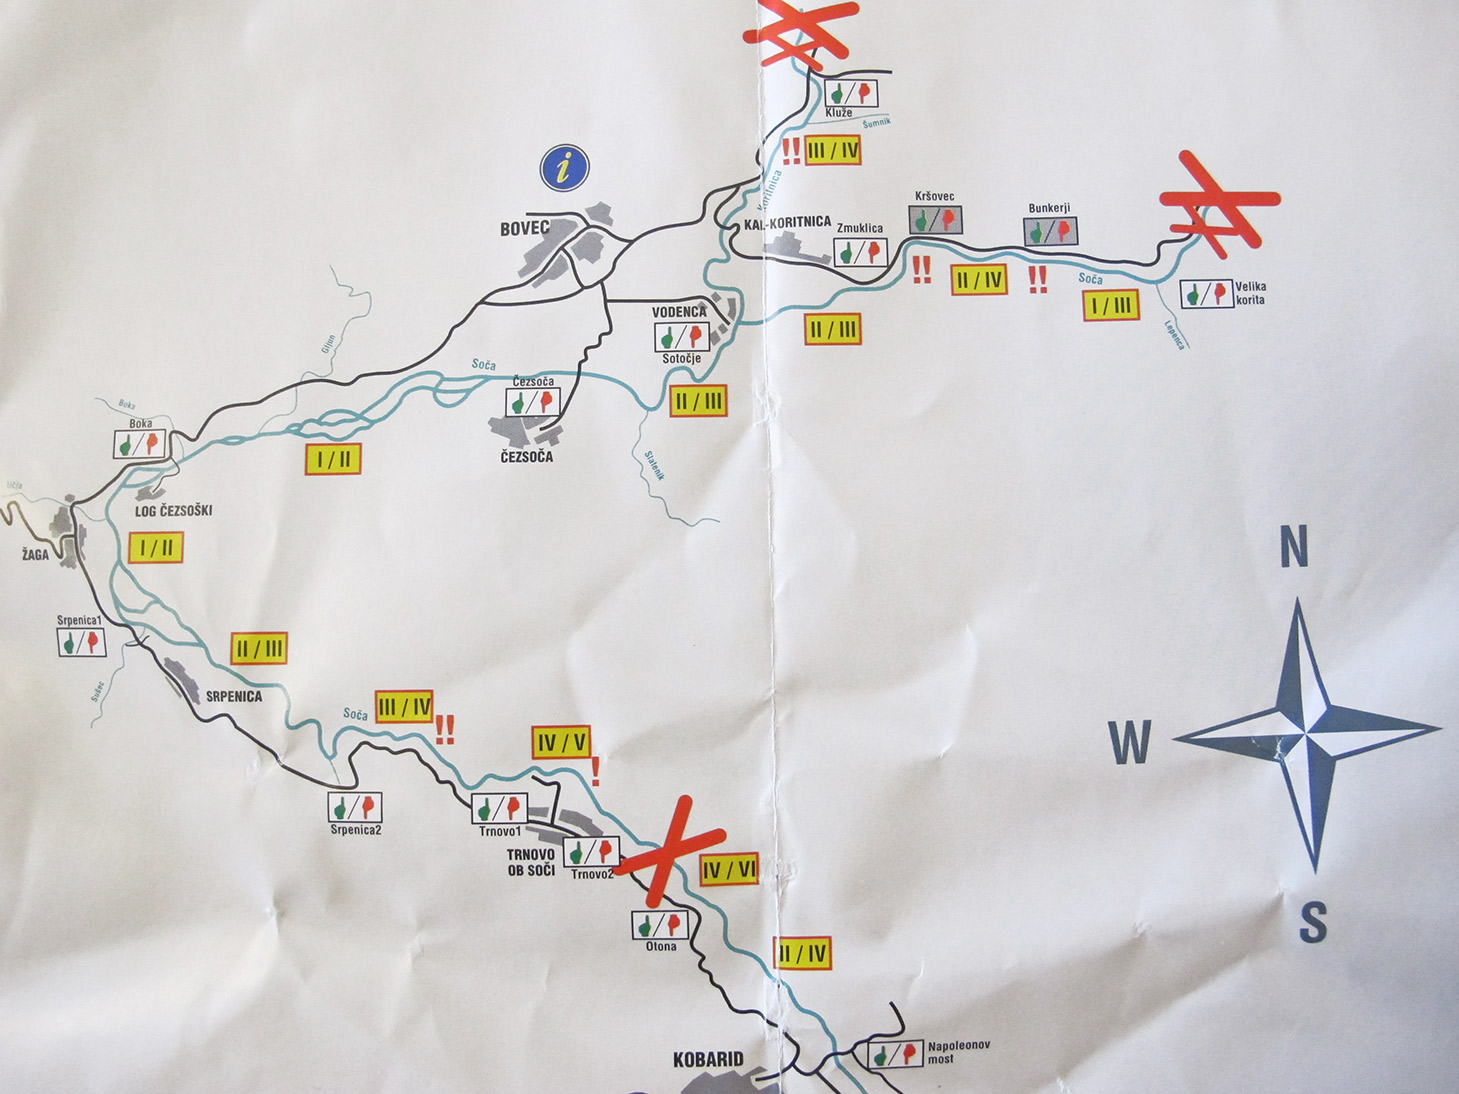 Mappa del Soca per il kayak